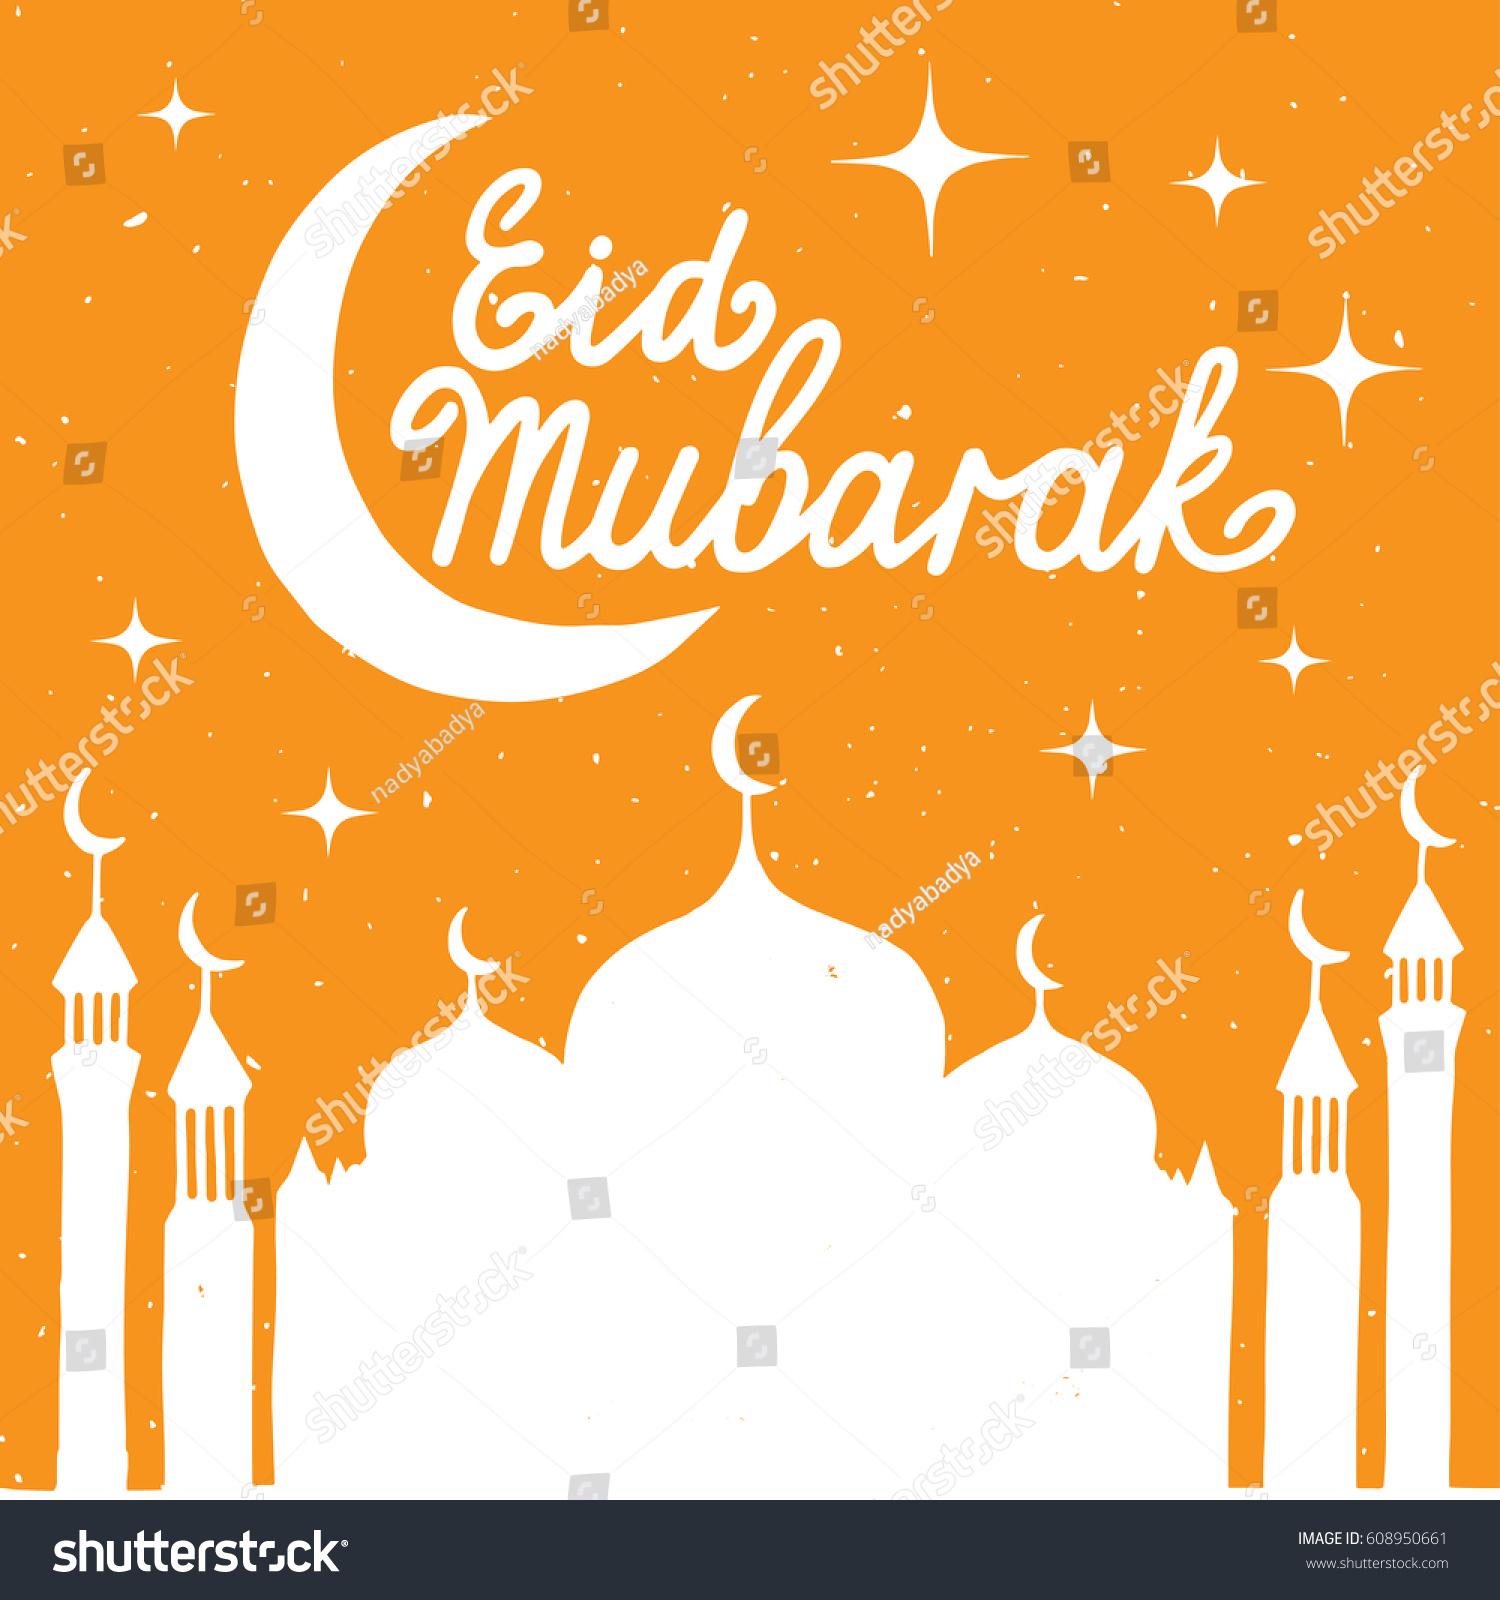 Eid Mubarak Handwritten Lettering Typographical Design